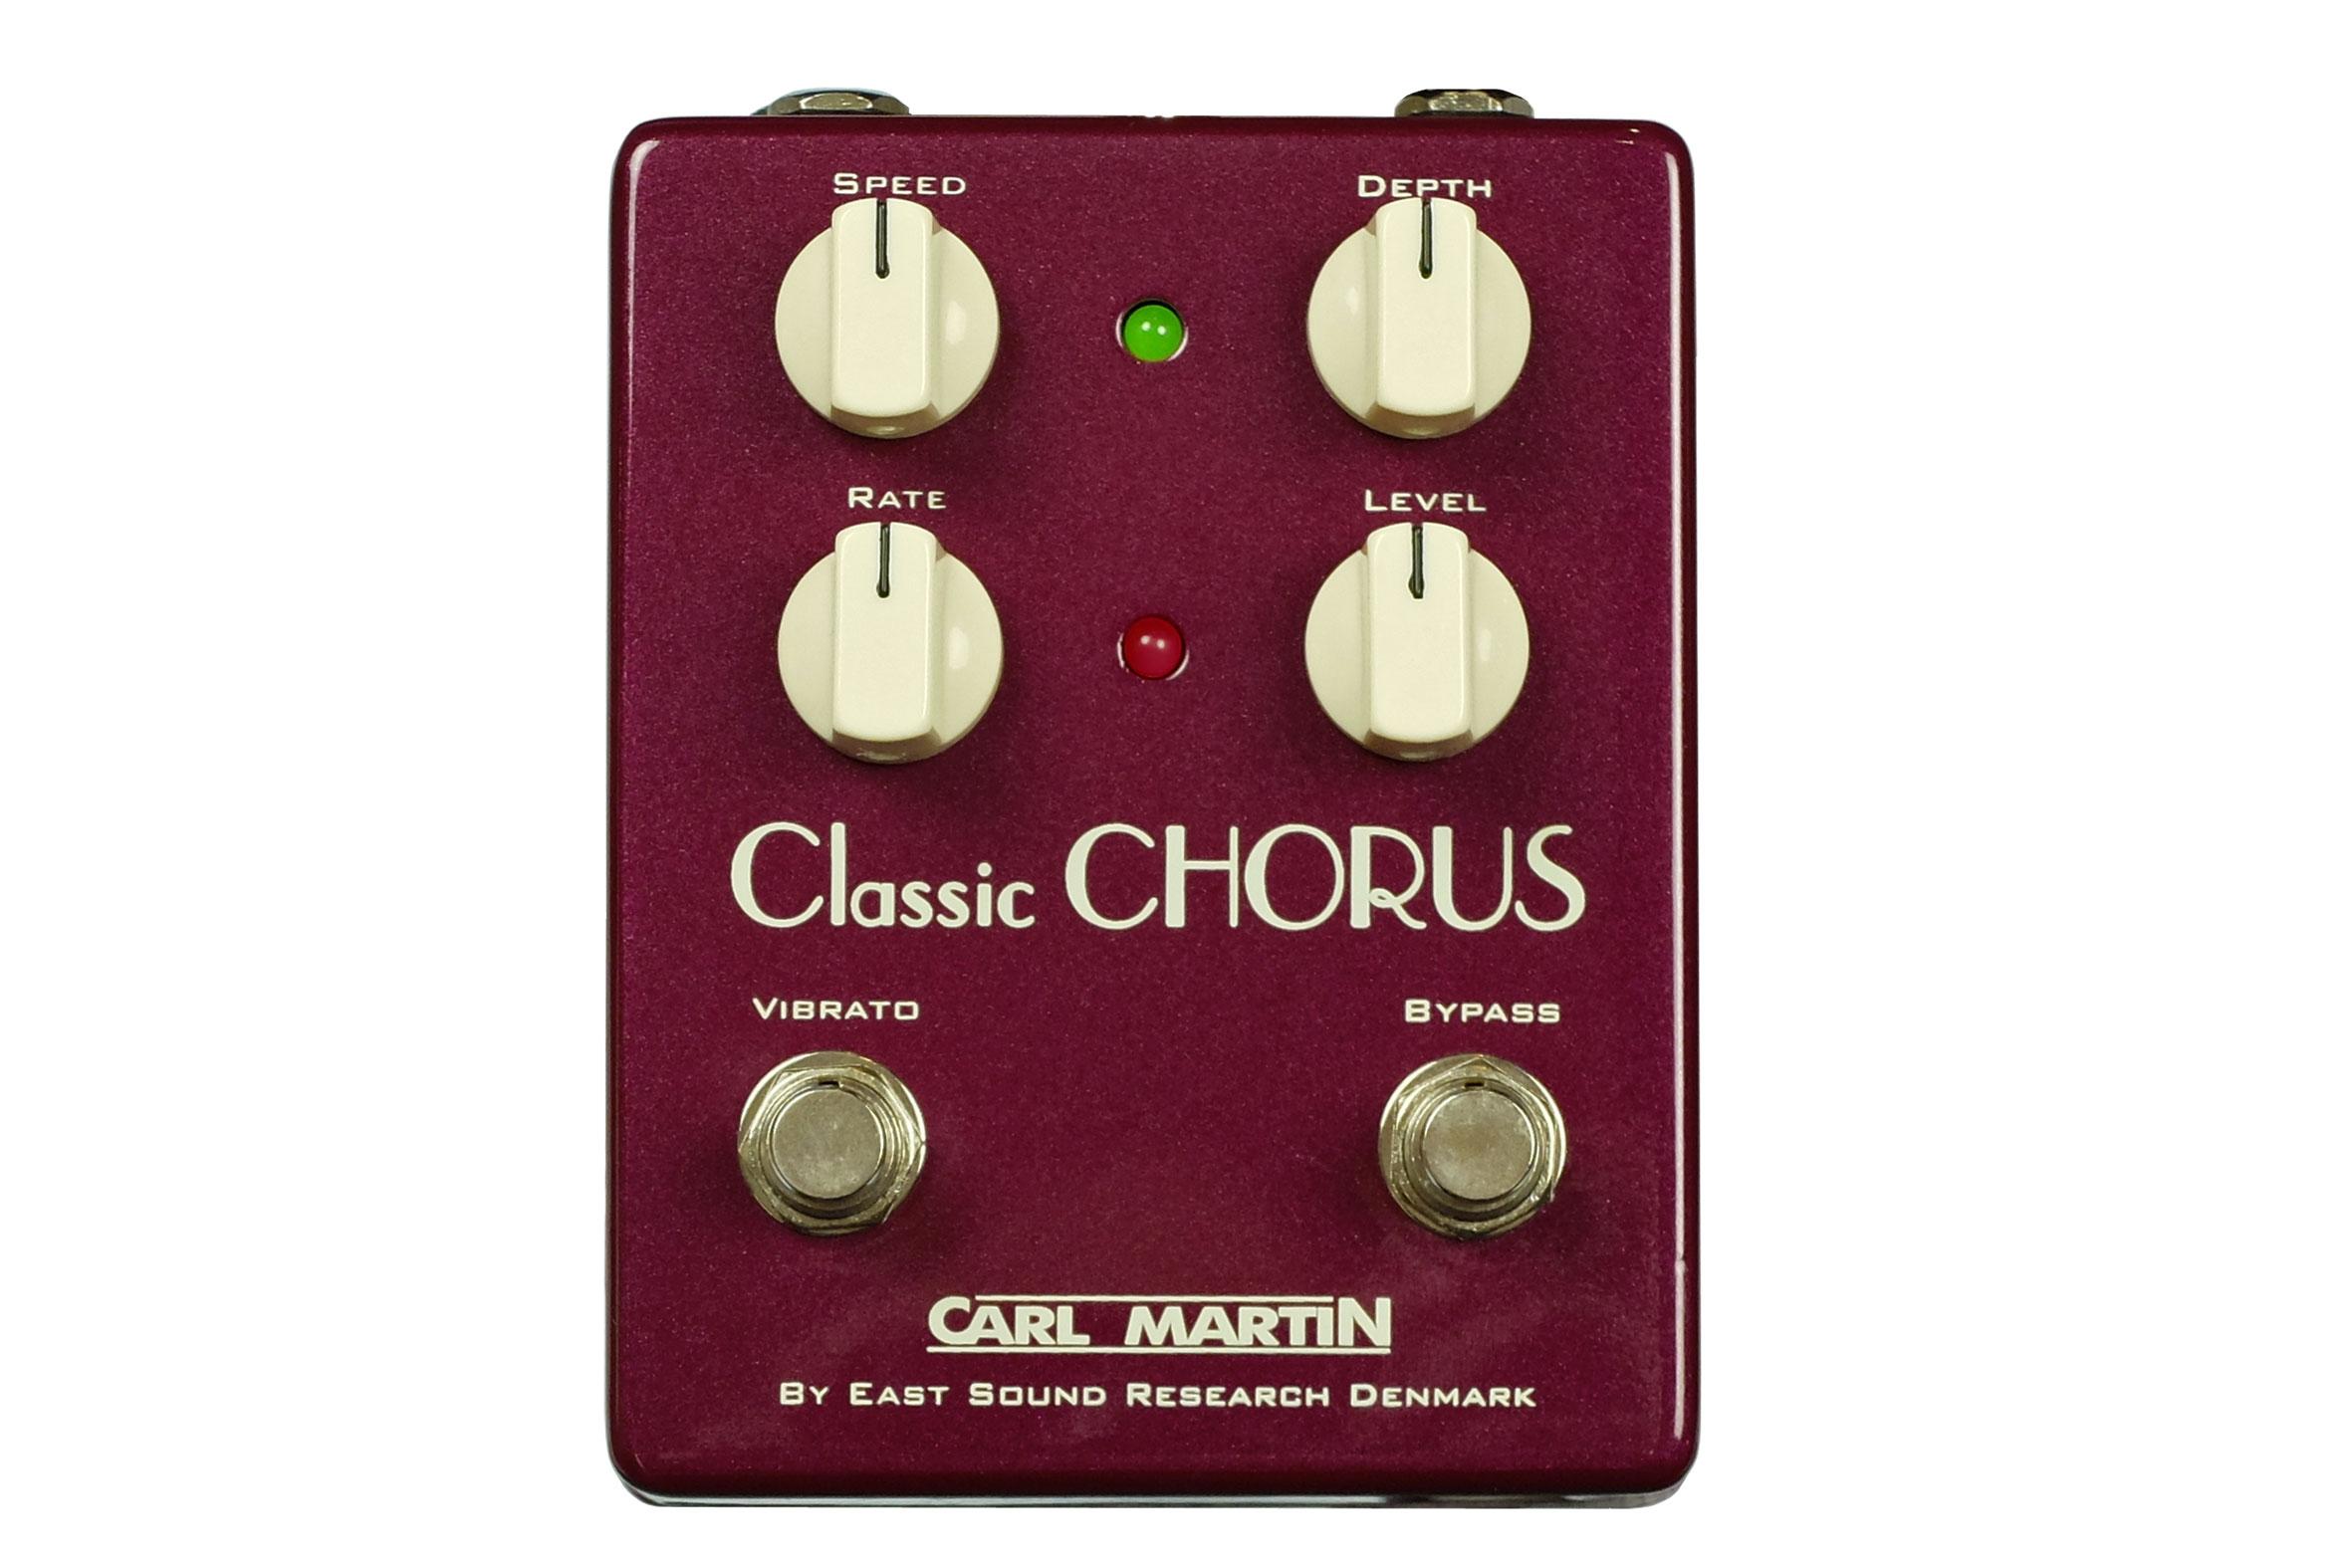 Carl Martin VIN CLASSIC CHORUS